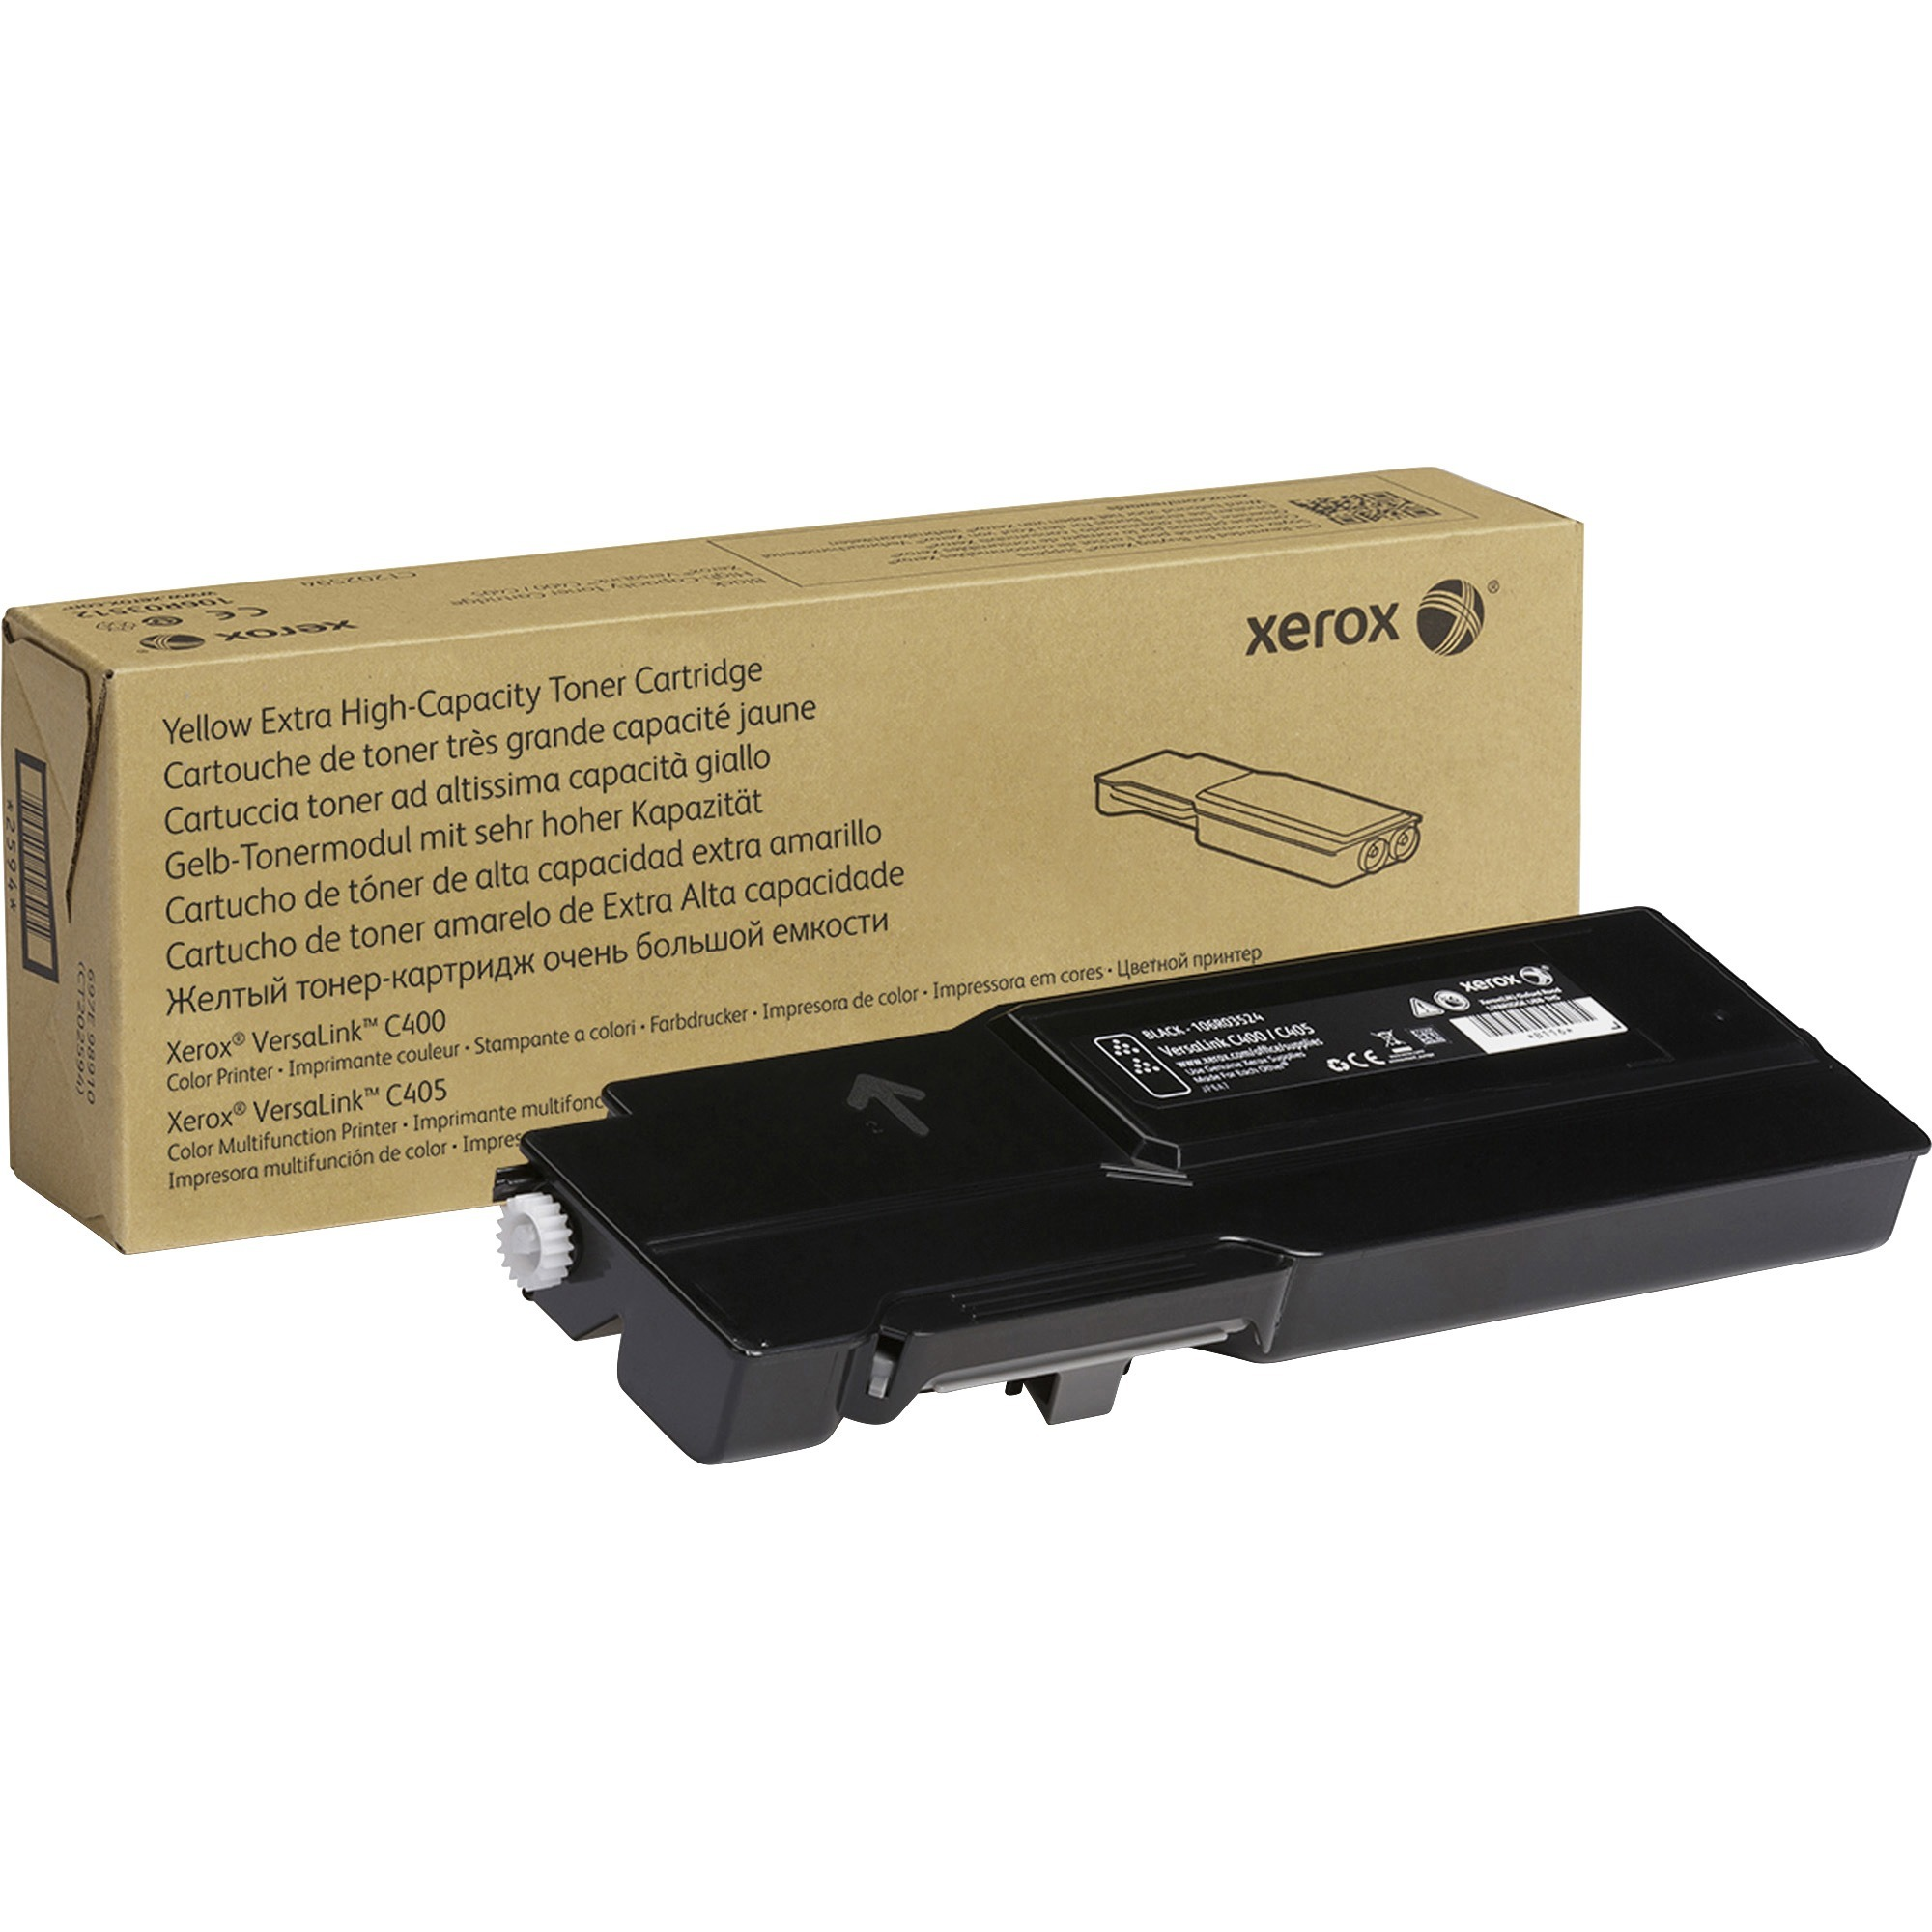 Xerox, XER106R03524, Genuine Black Extra High Capacity Toner Cartridge For The VersaLink C400/C405, 1 Each